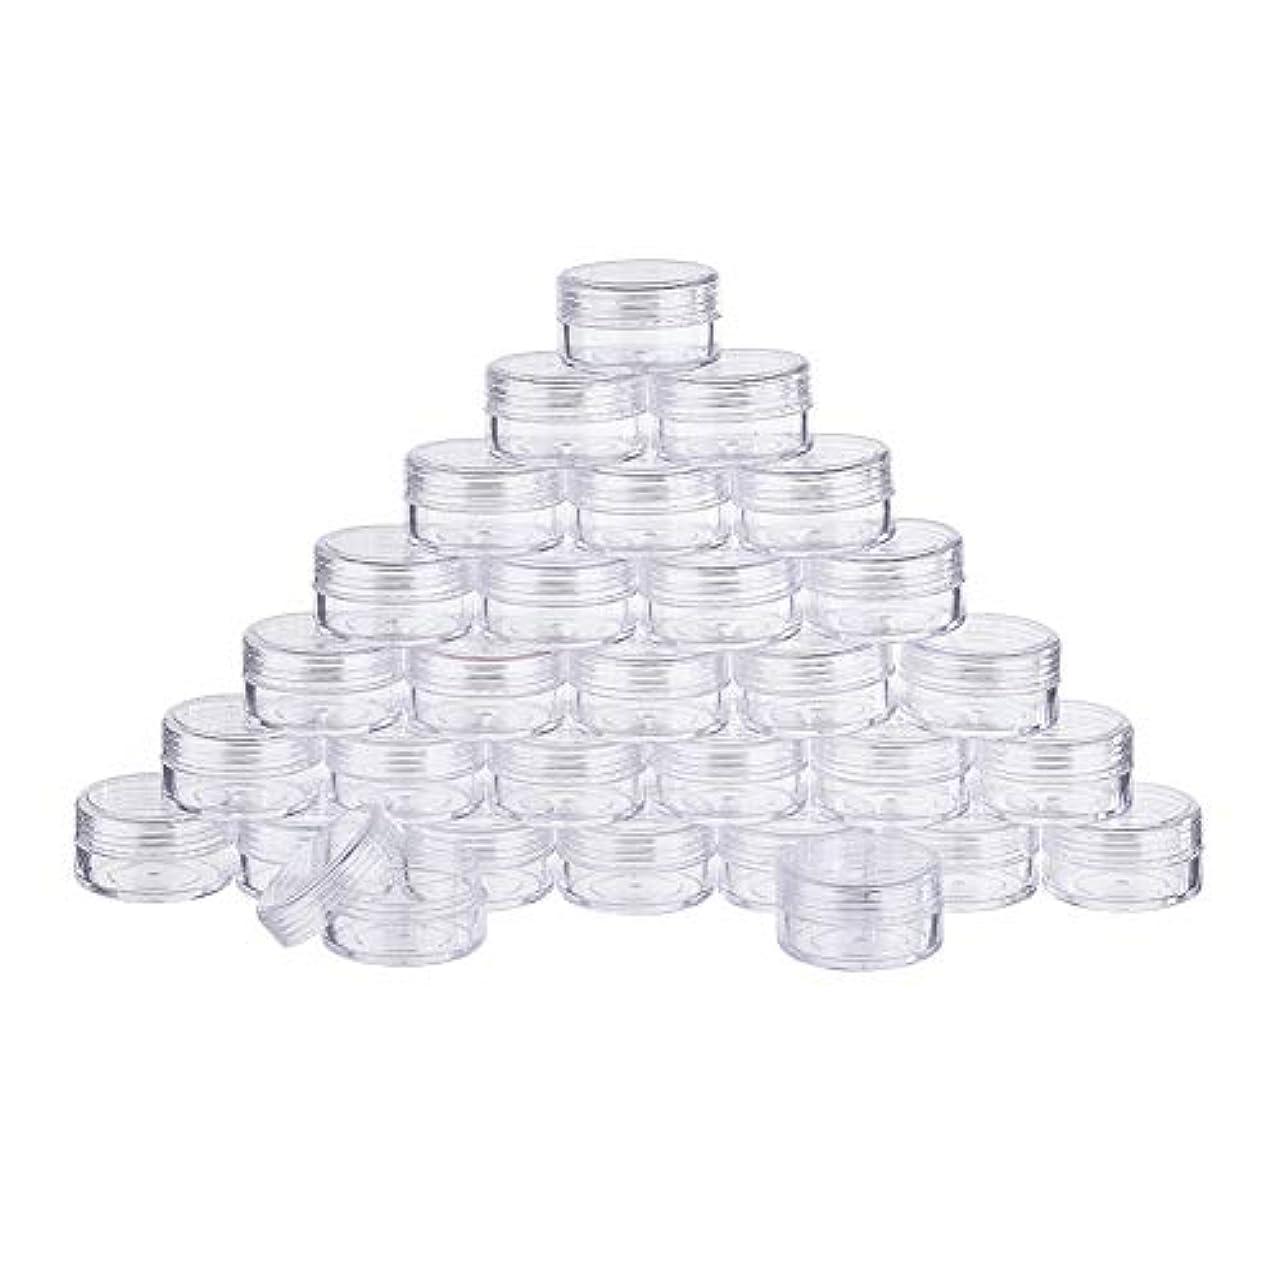 BENECREAT 30個セット15ml透明収納ボックス 化粧品用小分け容器 アクセサリー収納ボックス 蓋つき 丸型 ビーズ?小物 DIY工芸品